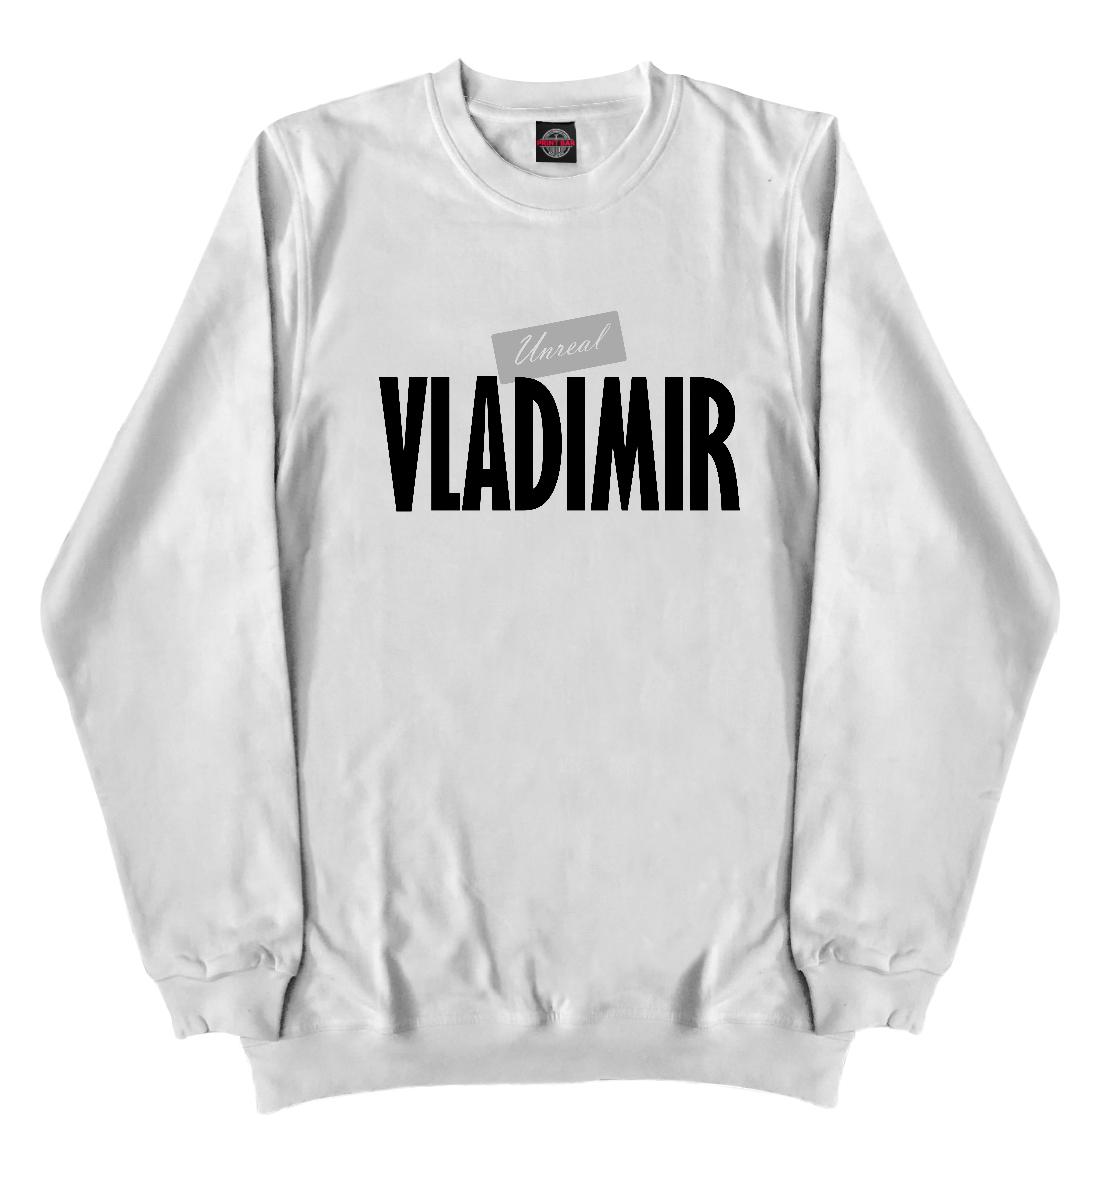 Unreal Vladimir